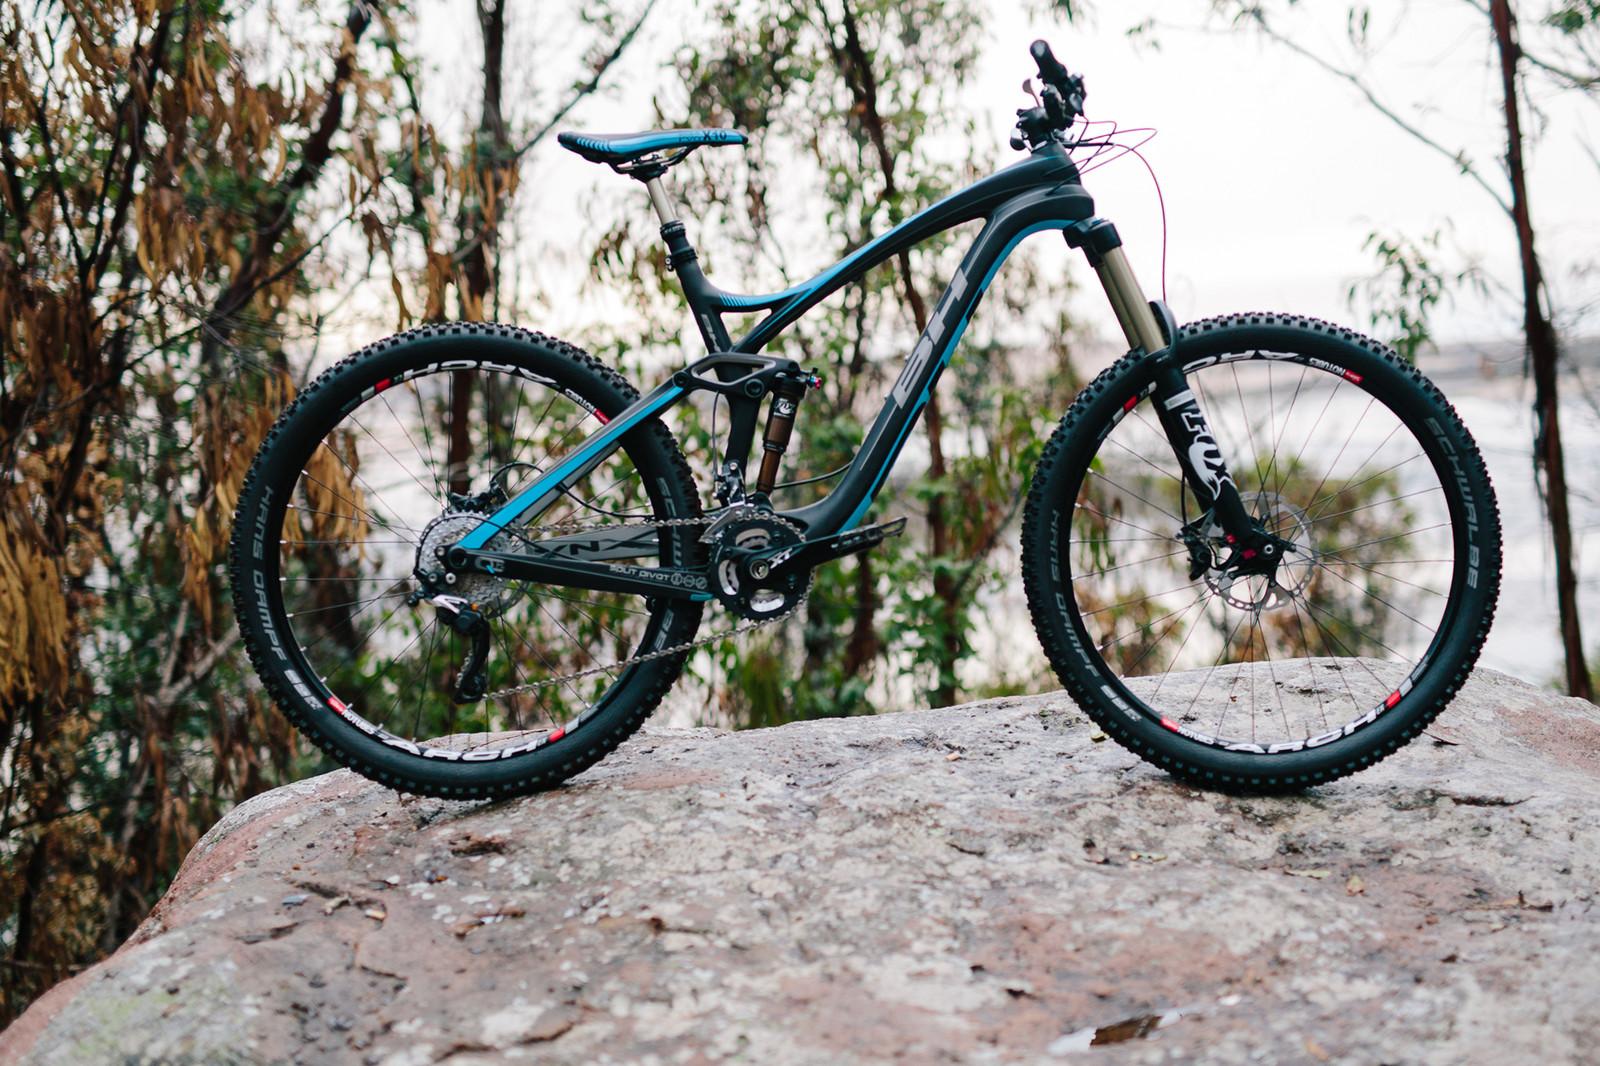 2015 BH Lynx 6 27.5 Carbon 9.7 - 19 Bikes Tested - 2015 Vital MTB Test Sessions - Mountain Biking Pictures - Vital MTB